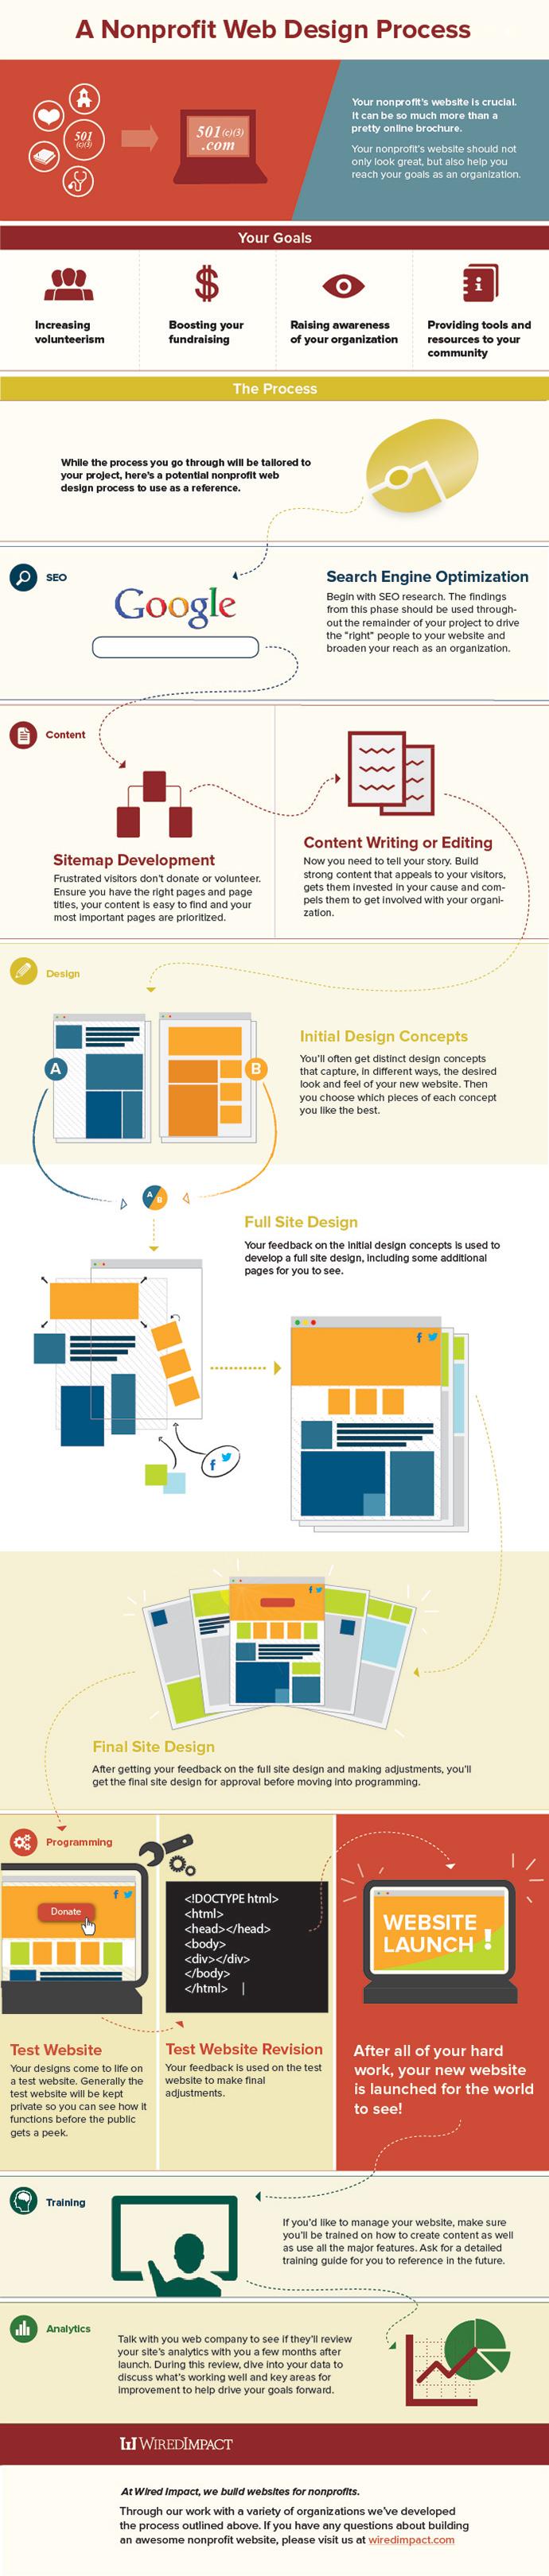 9 nonprofit-web-design-process